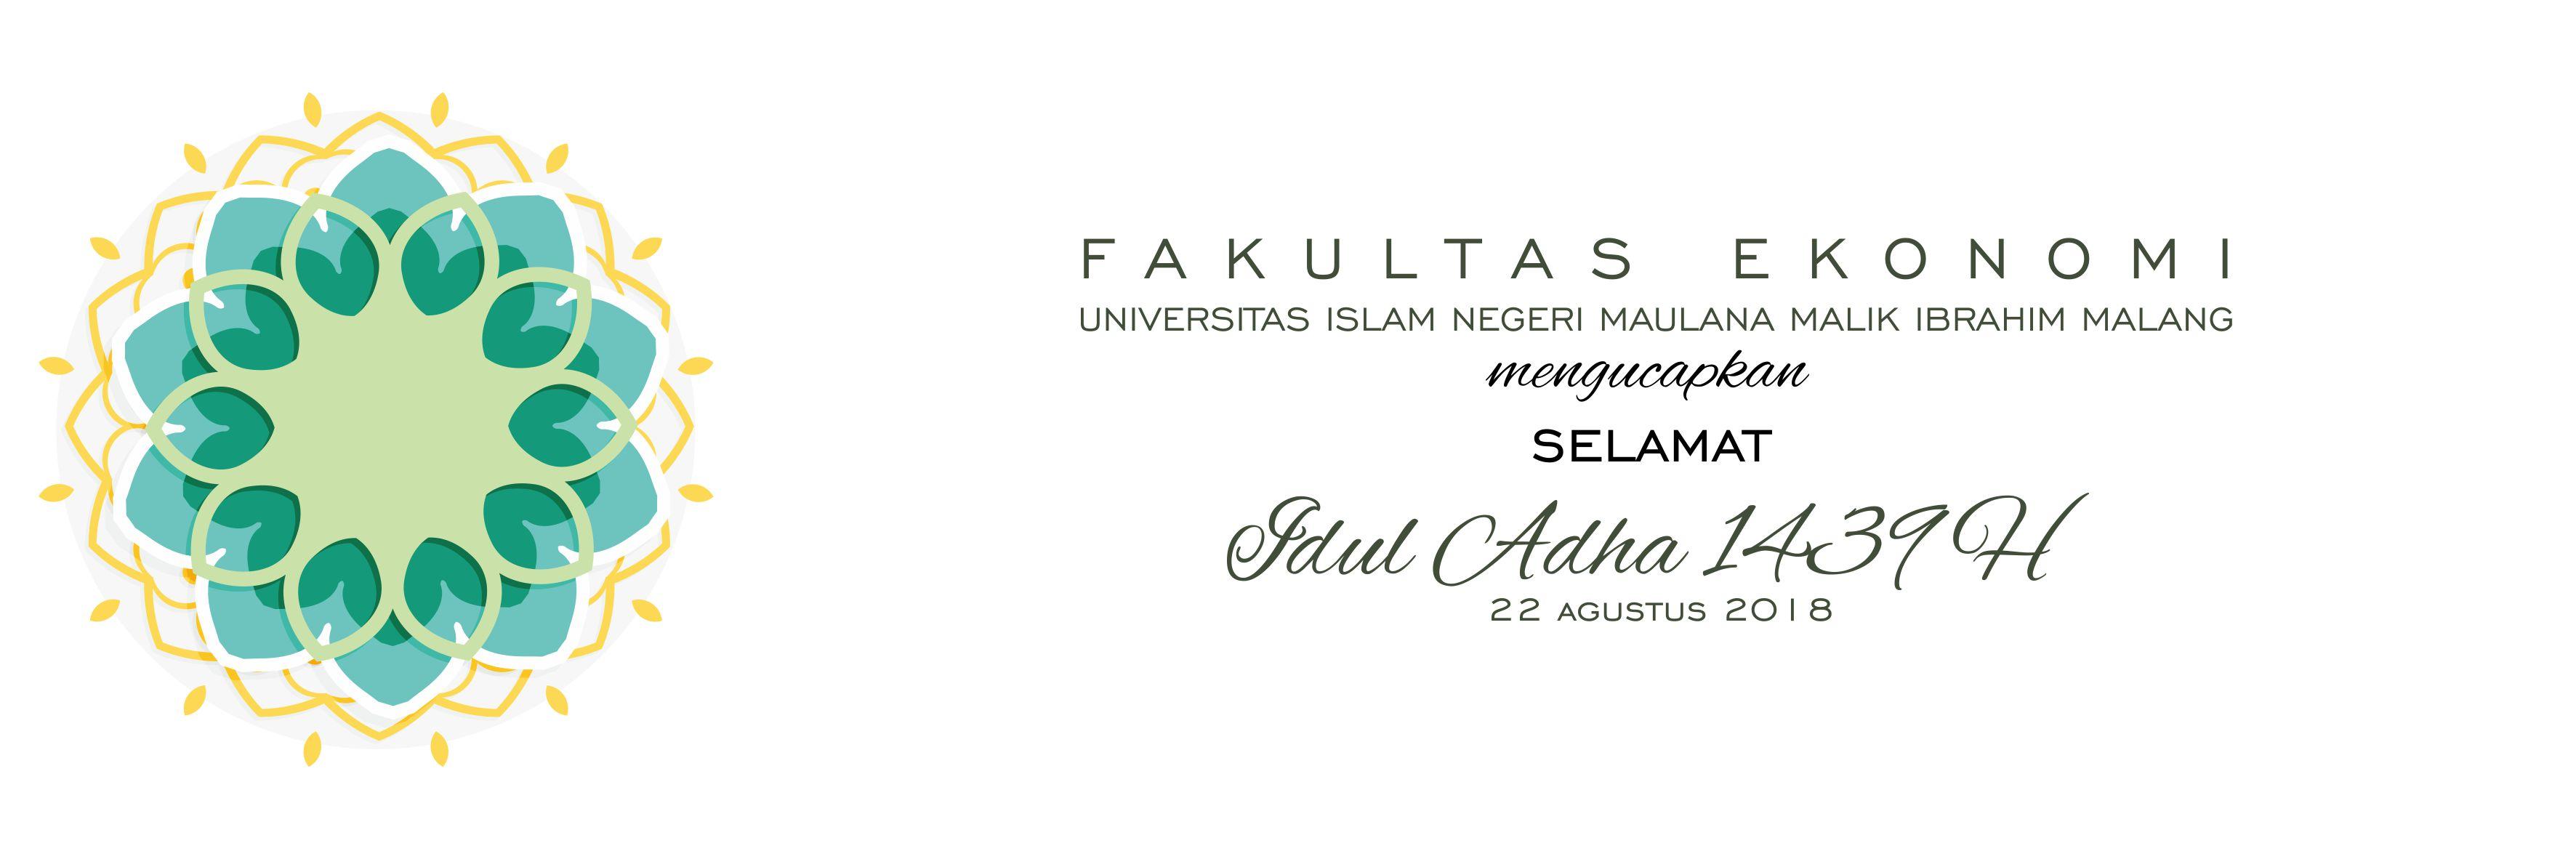 Fakultas Ekonomi Universitas Islam Negeri Maulana Malik Ibrahim